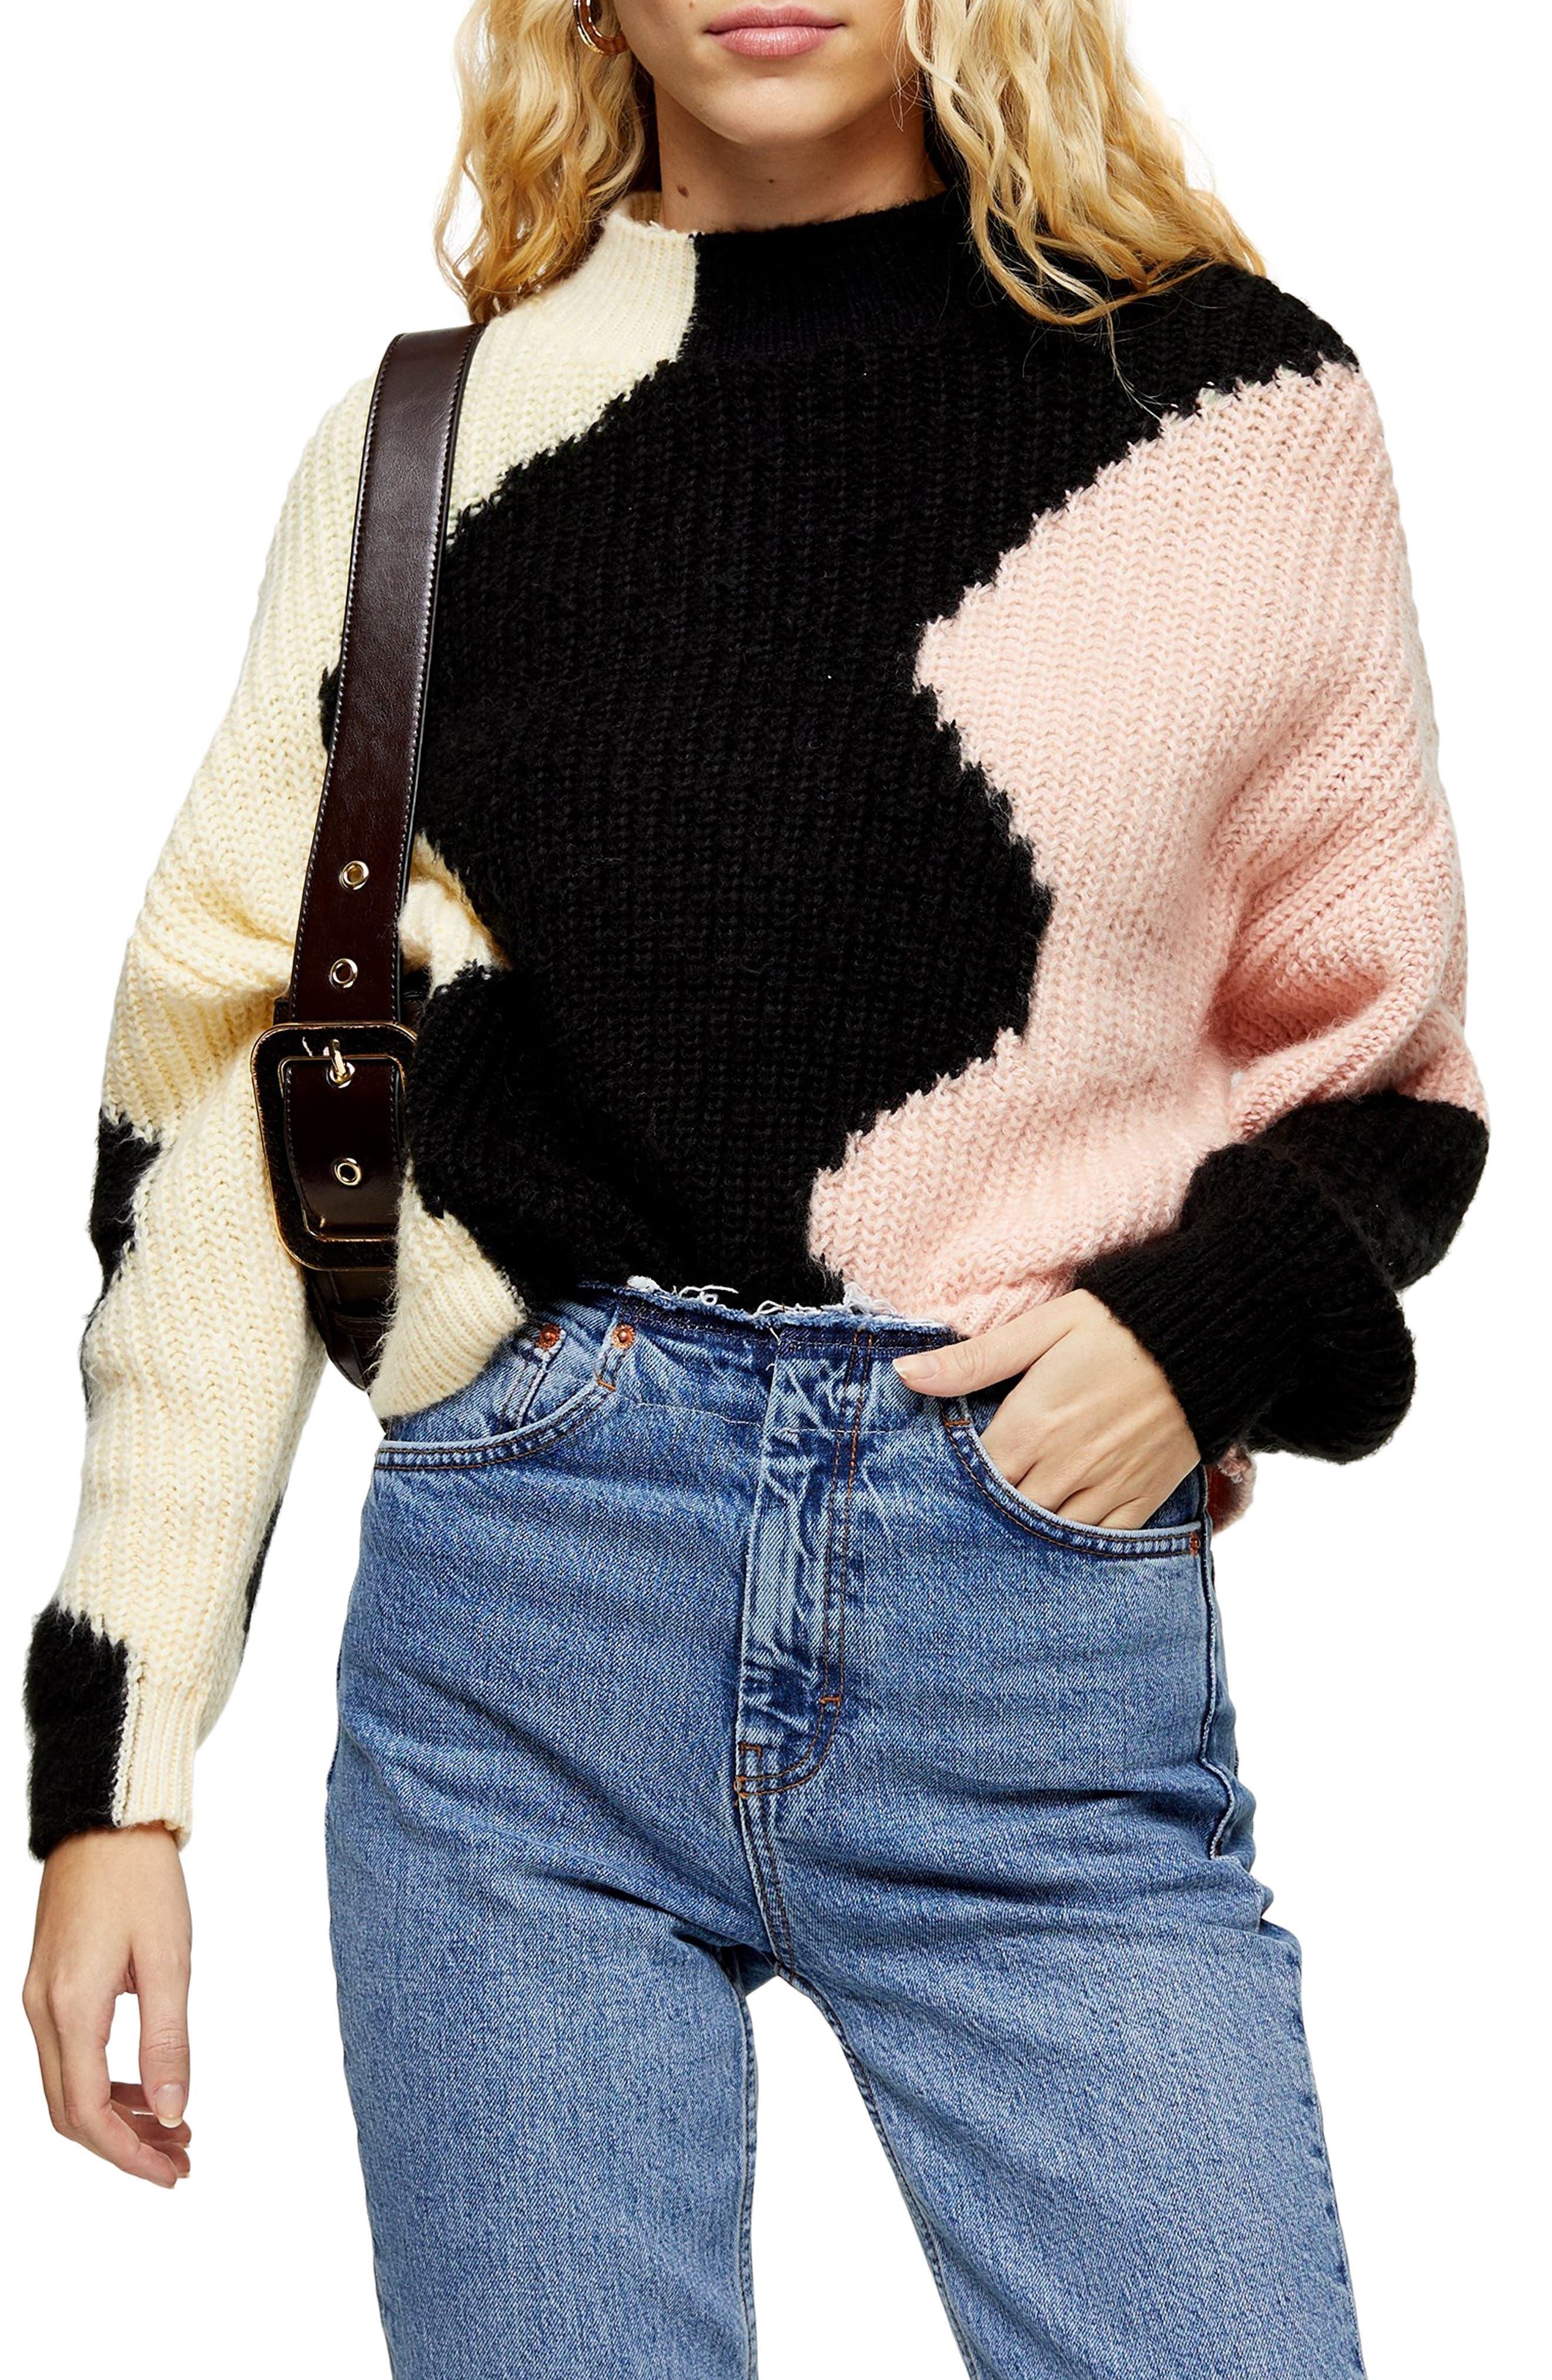 Topshop Wave Pattern Mock Neck Sweater